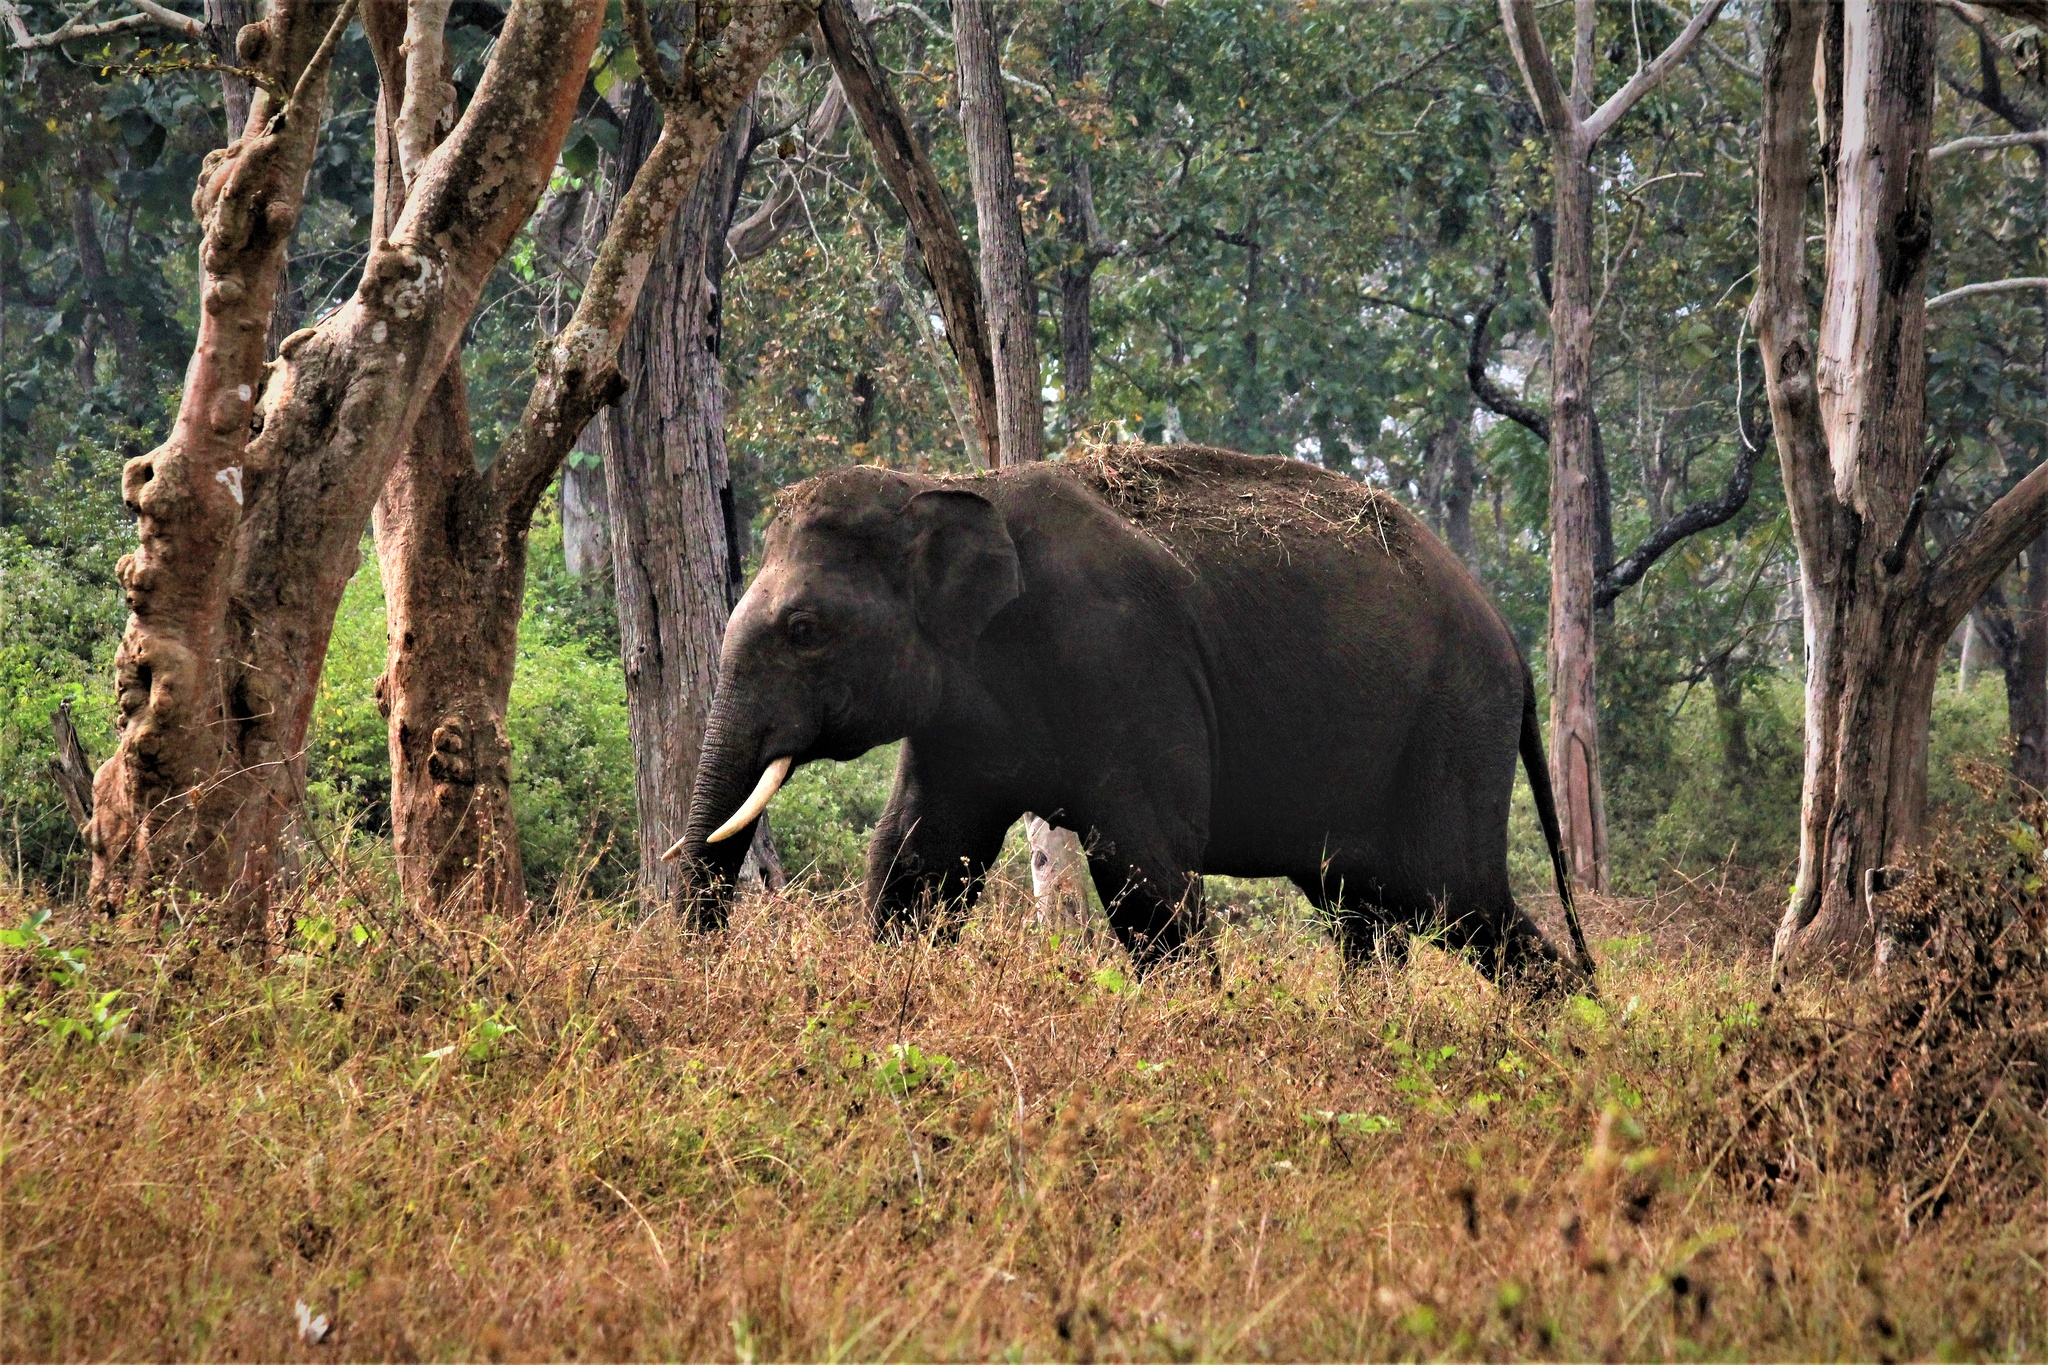 Elephant Wildlife 2048x1365